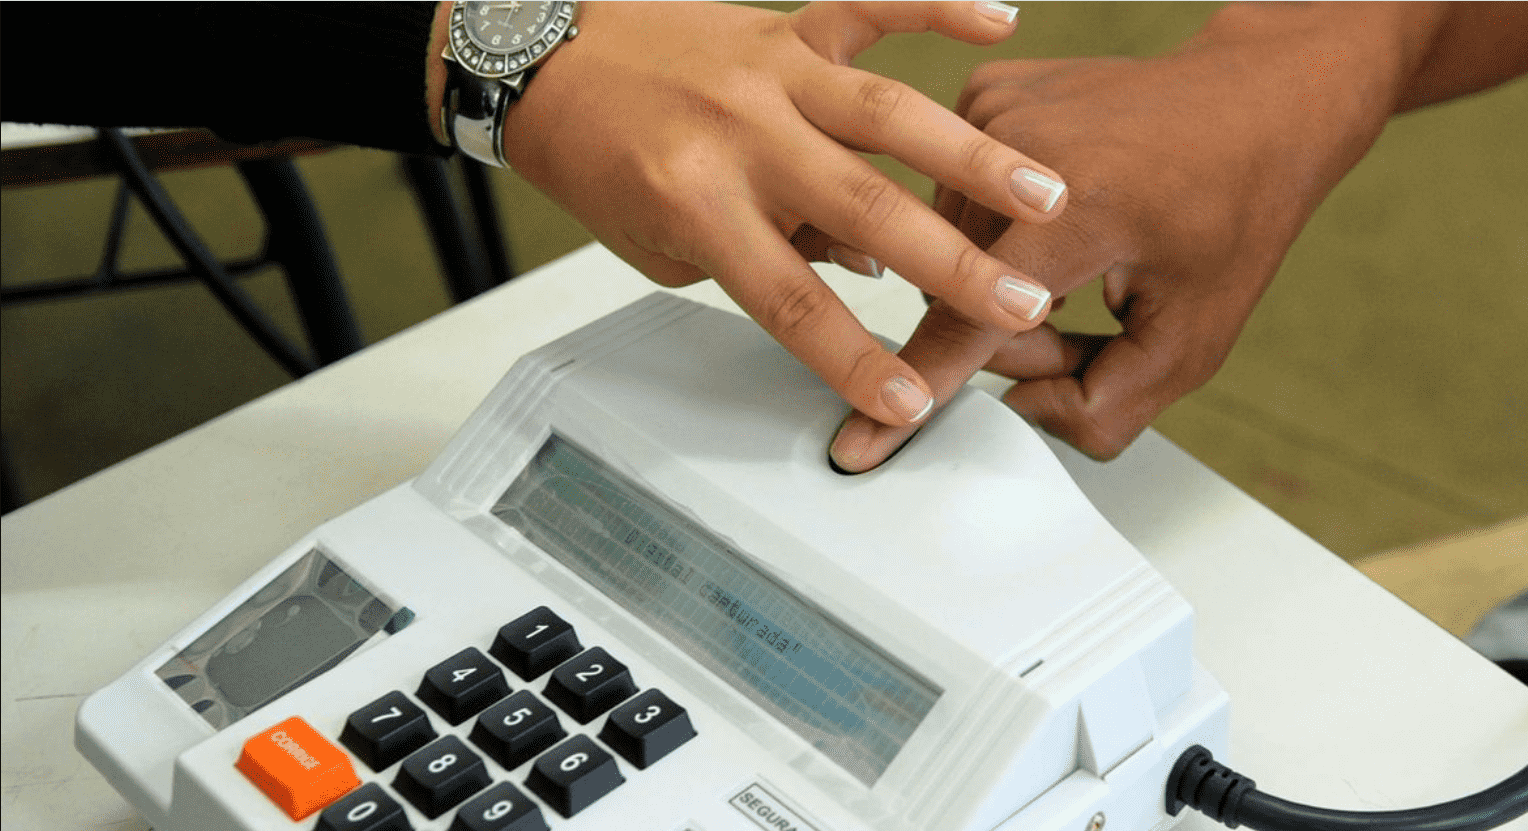 Foto mostra biometria sendo feita